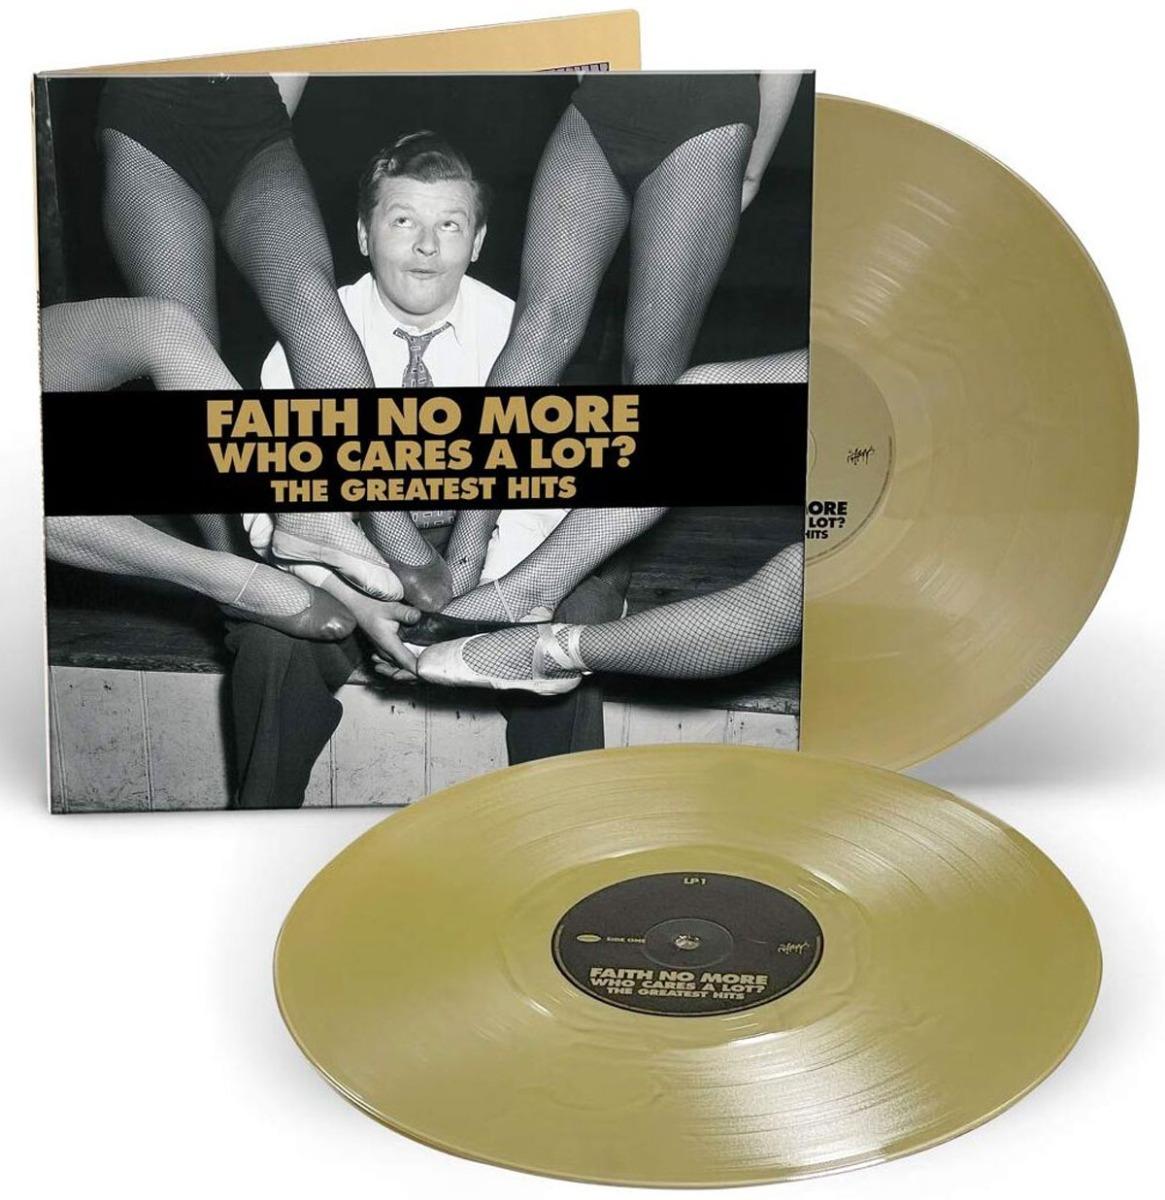 Faith No More - Who Cares A Lot? The Greatest Hits Gelimiteerd Goud Vinyl 2LP